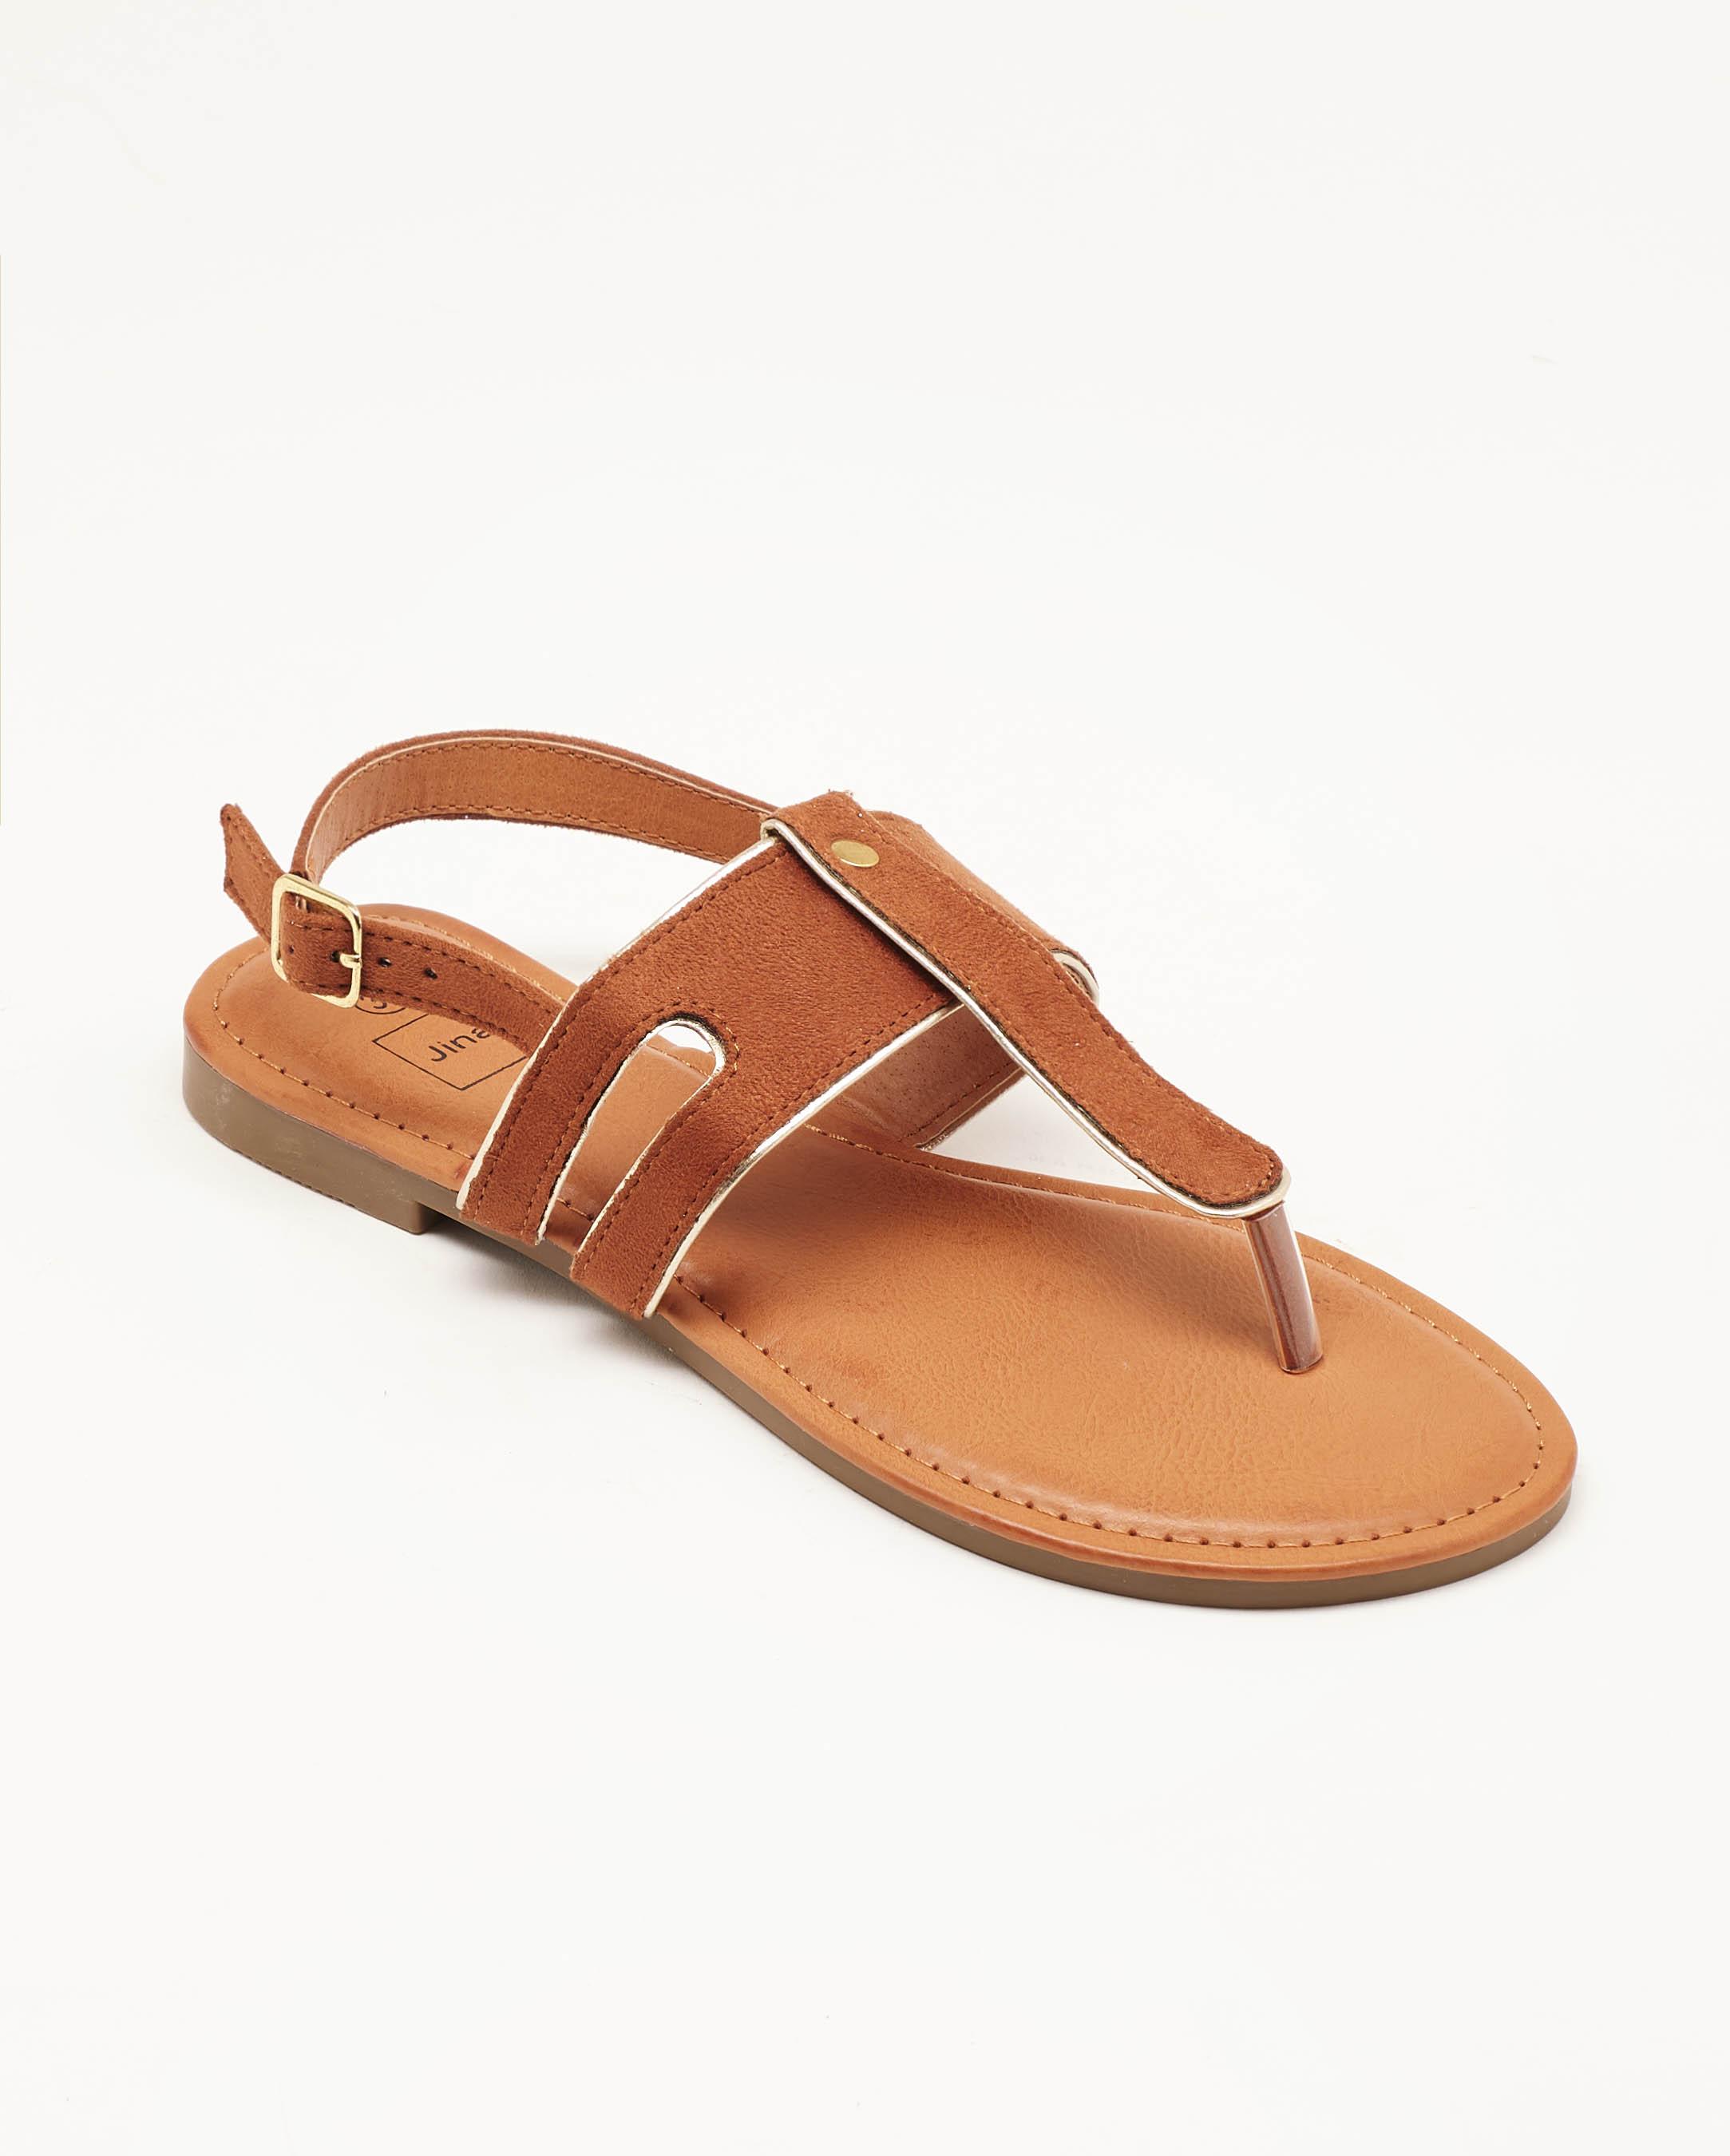 Sandales Plates Femme - Sandale Plate Camel Jina - Nady